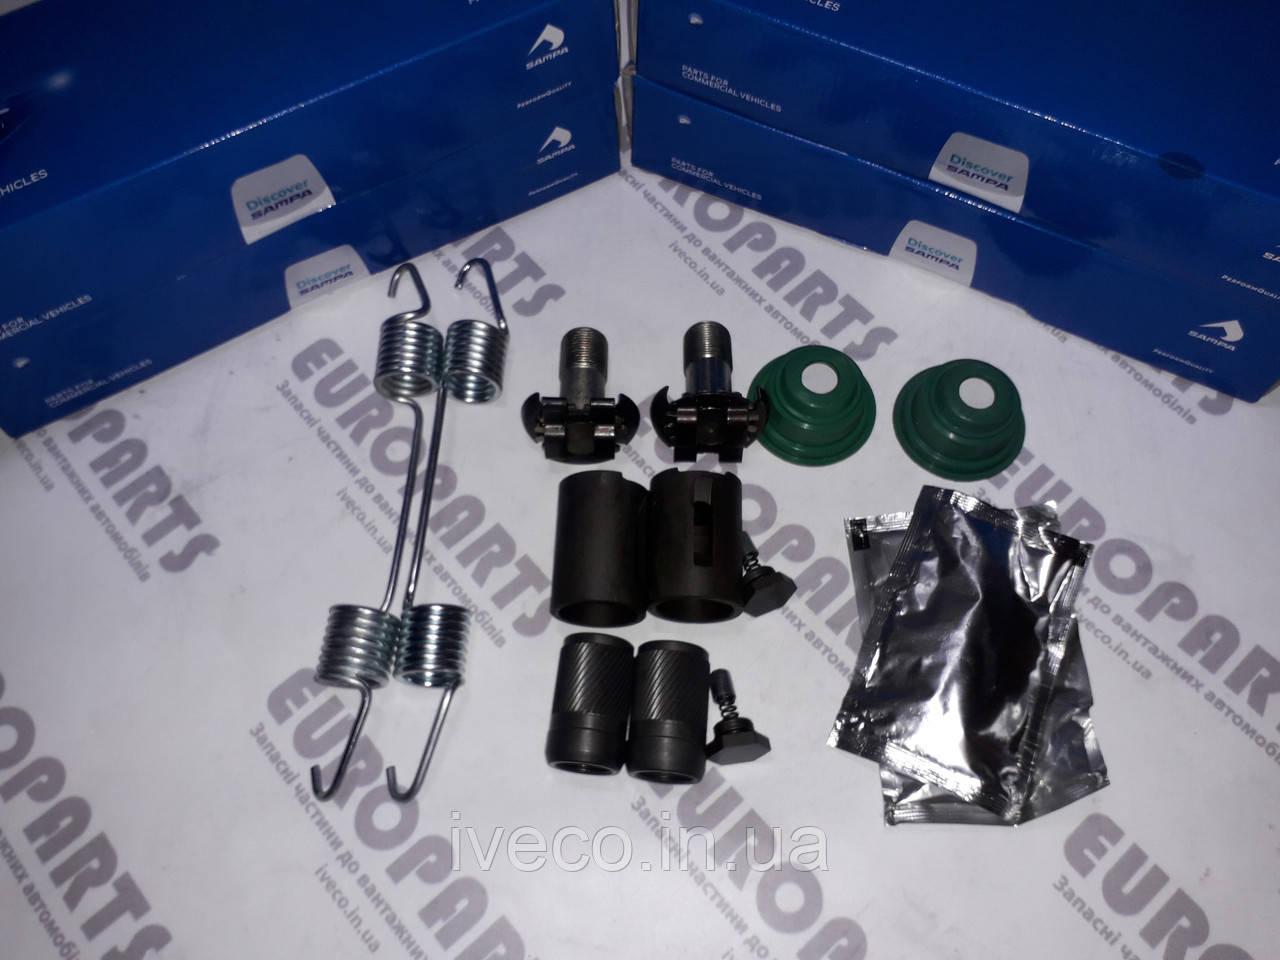 Ремкомплект тормозной Ивеко Тракер Iveco Trakker EuroTrakker 42536197 42550961